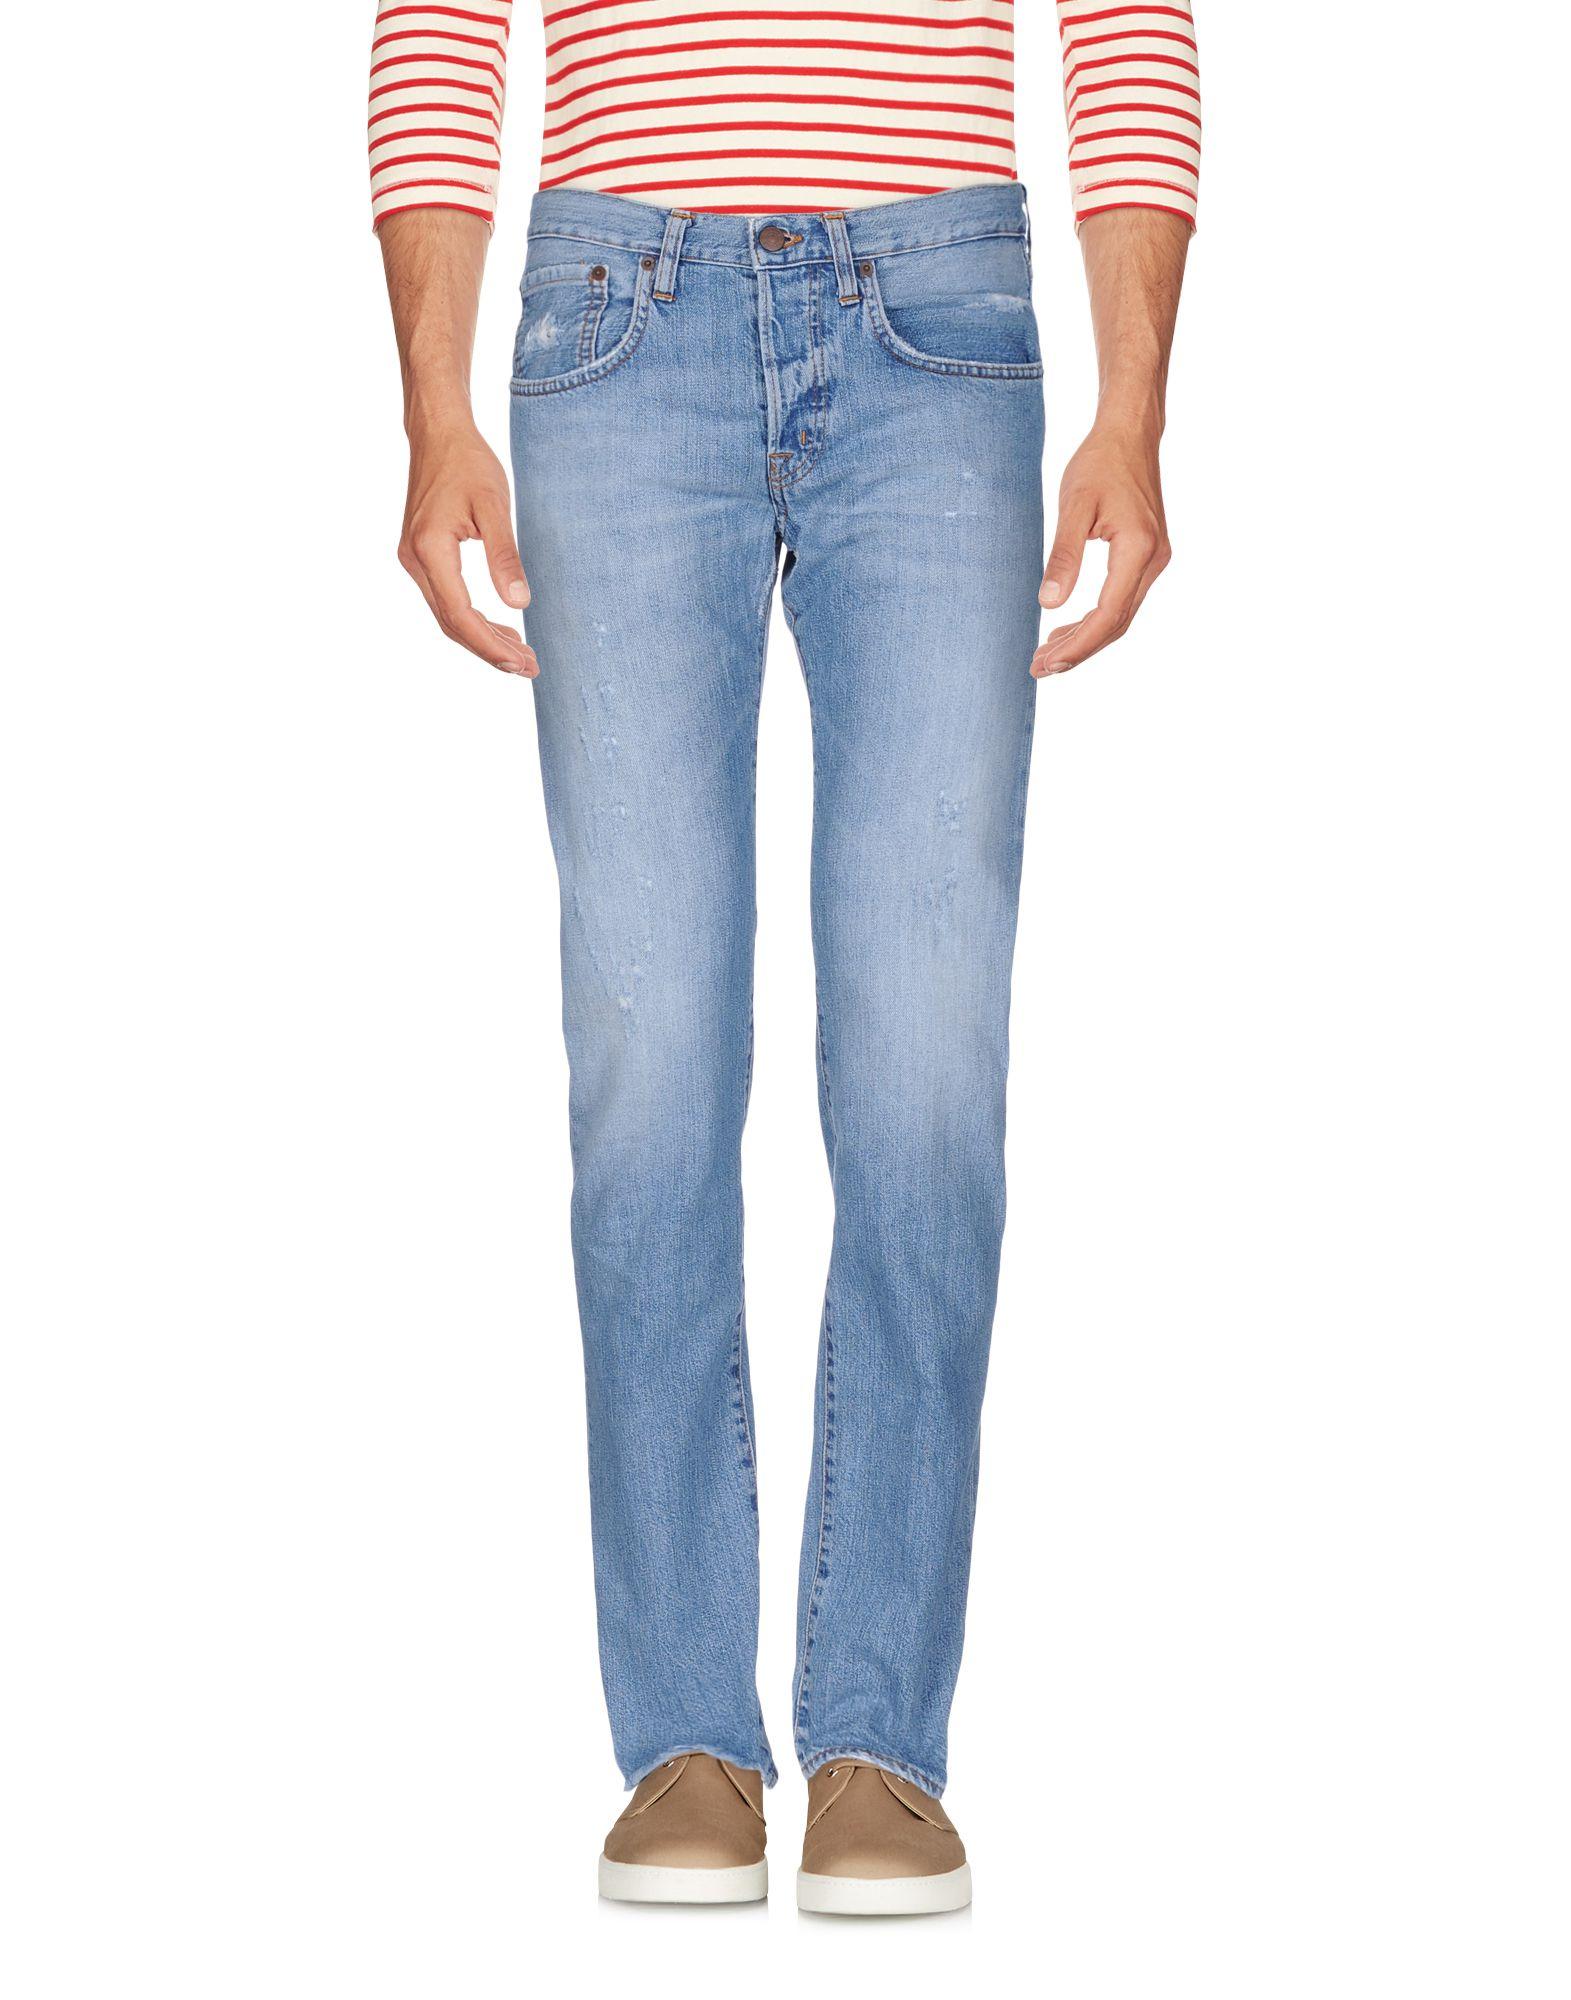 Pantaloni Jeans (+) People Uomo - 42624223SV 42624223SV - 662204